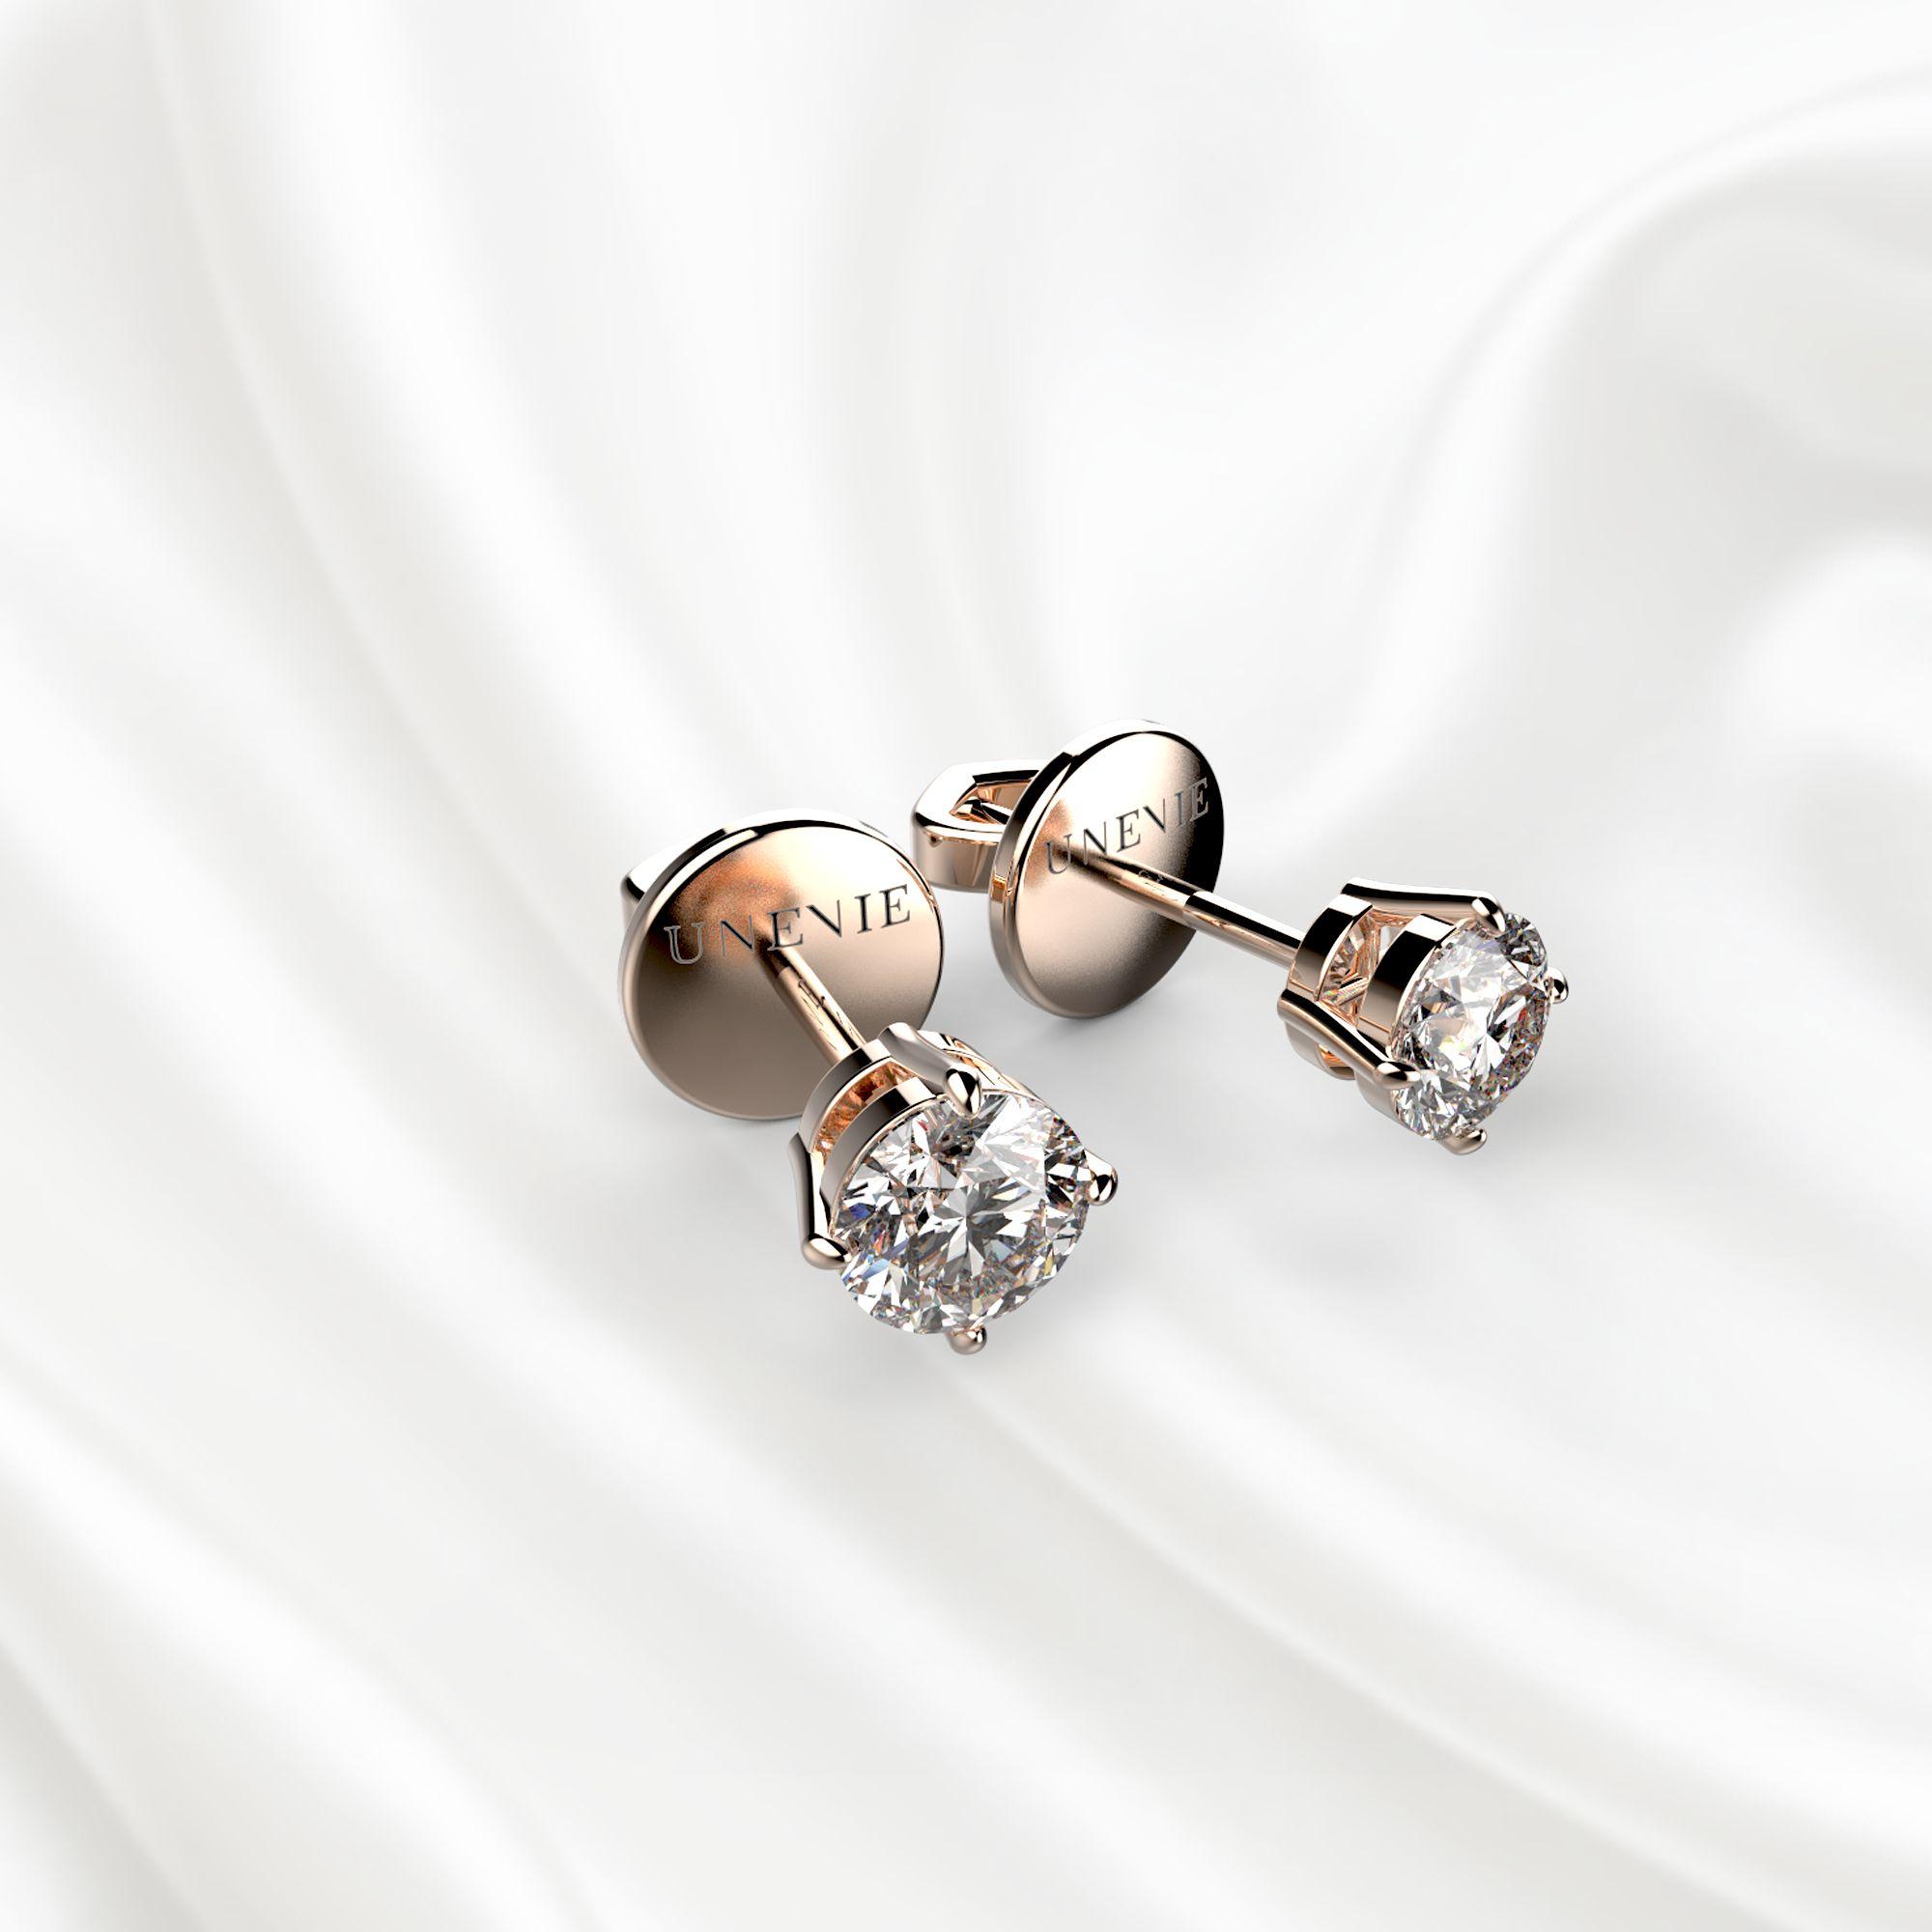 S3 Серьги из розового золота с бриллиантами 0,3 карат